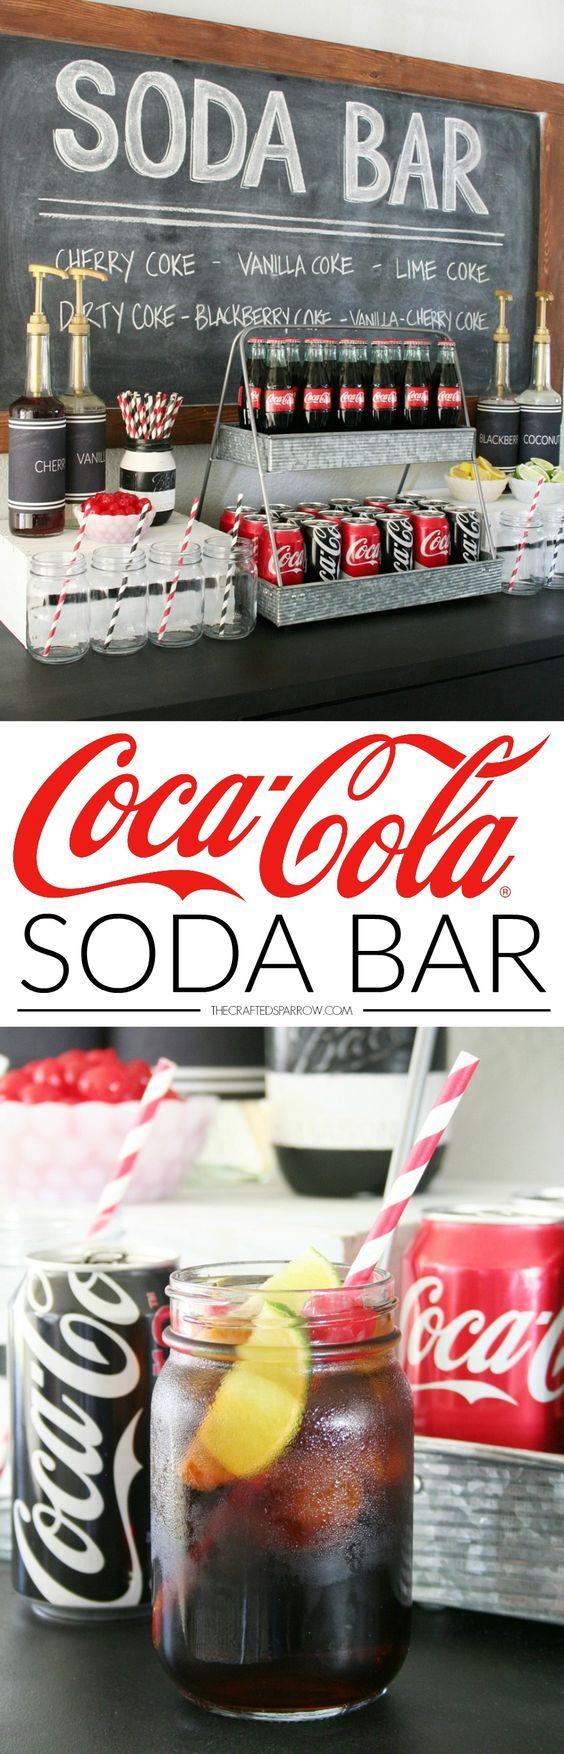 What a fun party idea - an old fashioned soda bar!